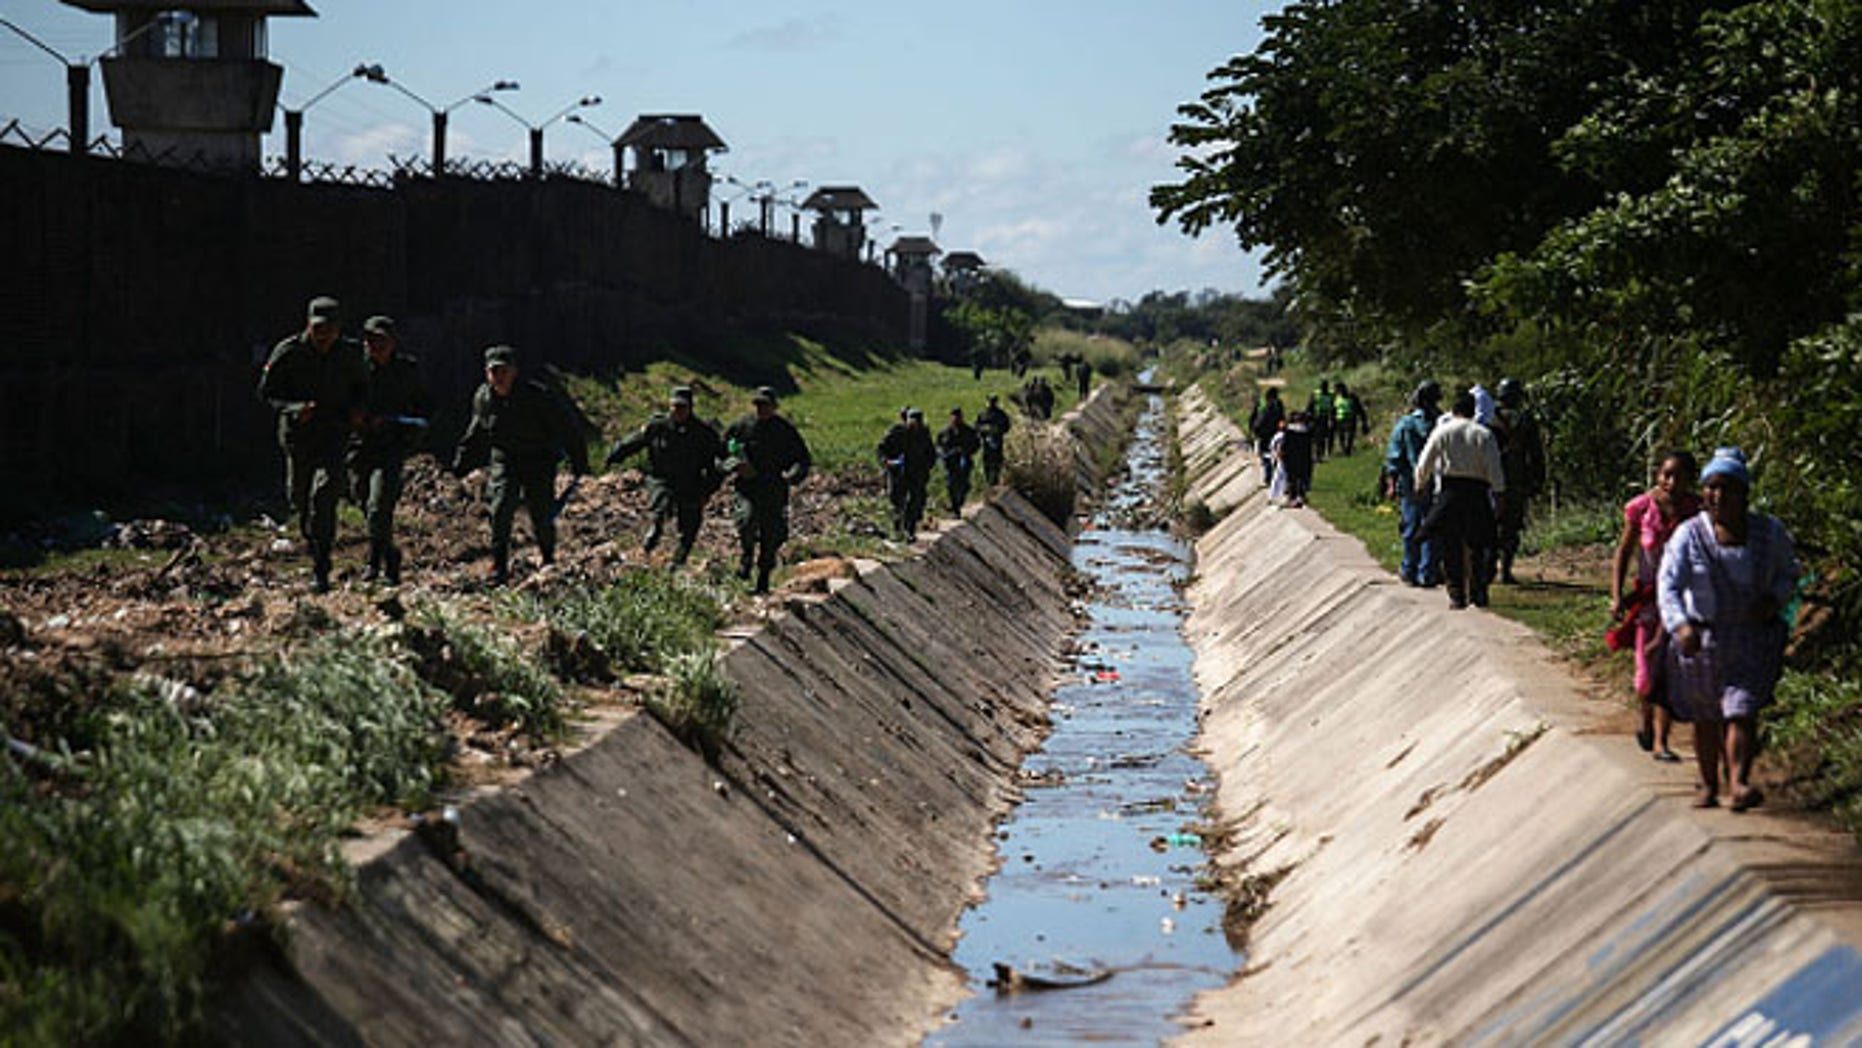 Army soldiers walk outside the Palmasola prison on July 10, 2015 in Santa Cruz, Bolivia.